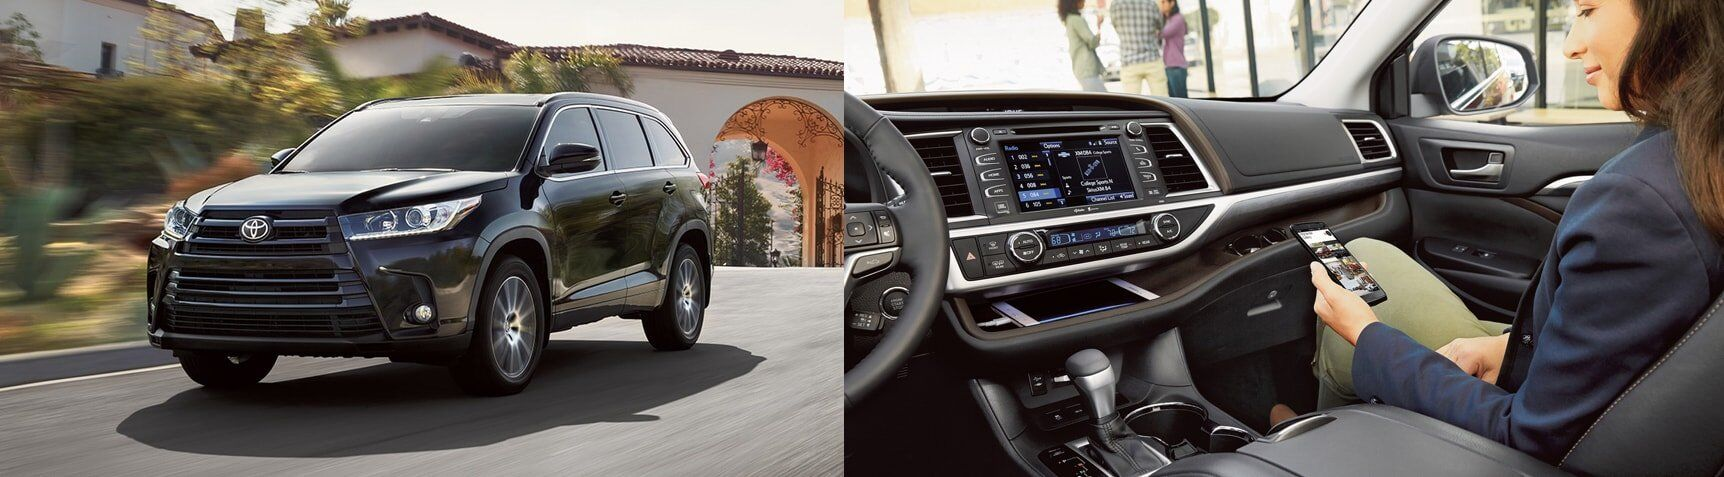 2017 Toyota Highlander Interior and Exterior